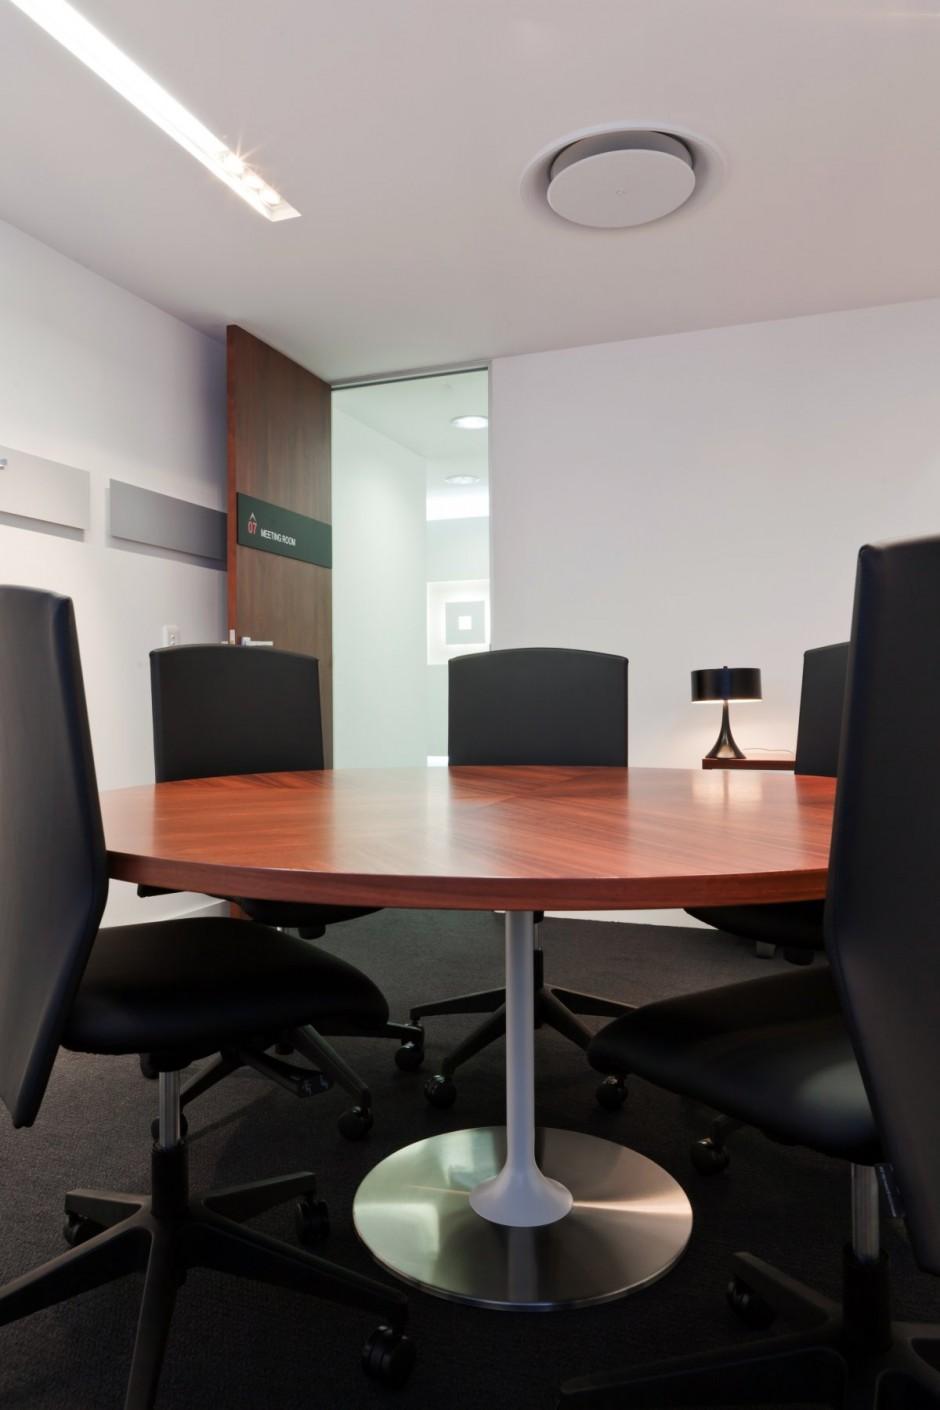 Meeting Room Interior Design Ideas: OFFICE MEETING ROOM DESIGN IDEAS